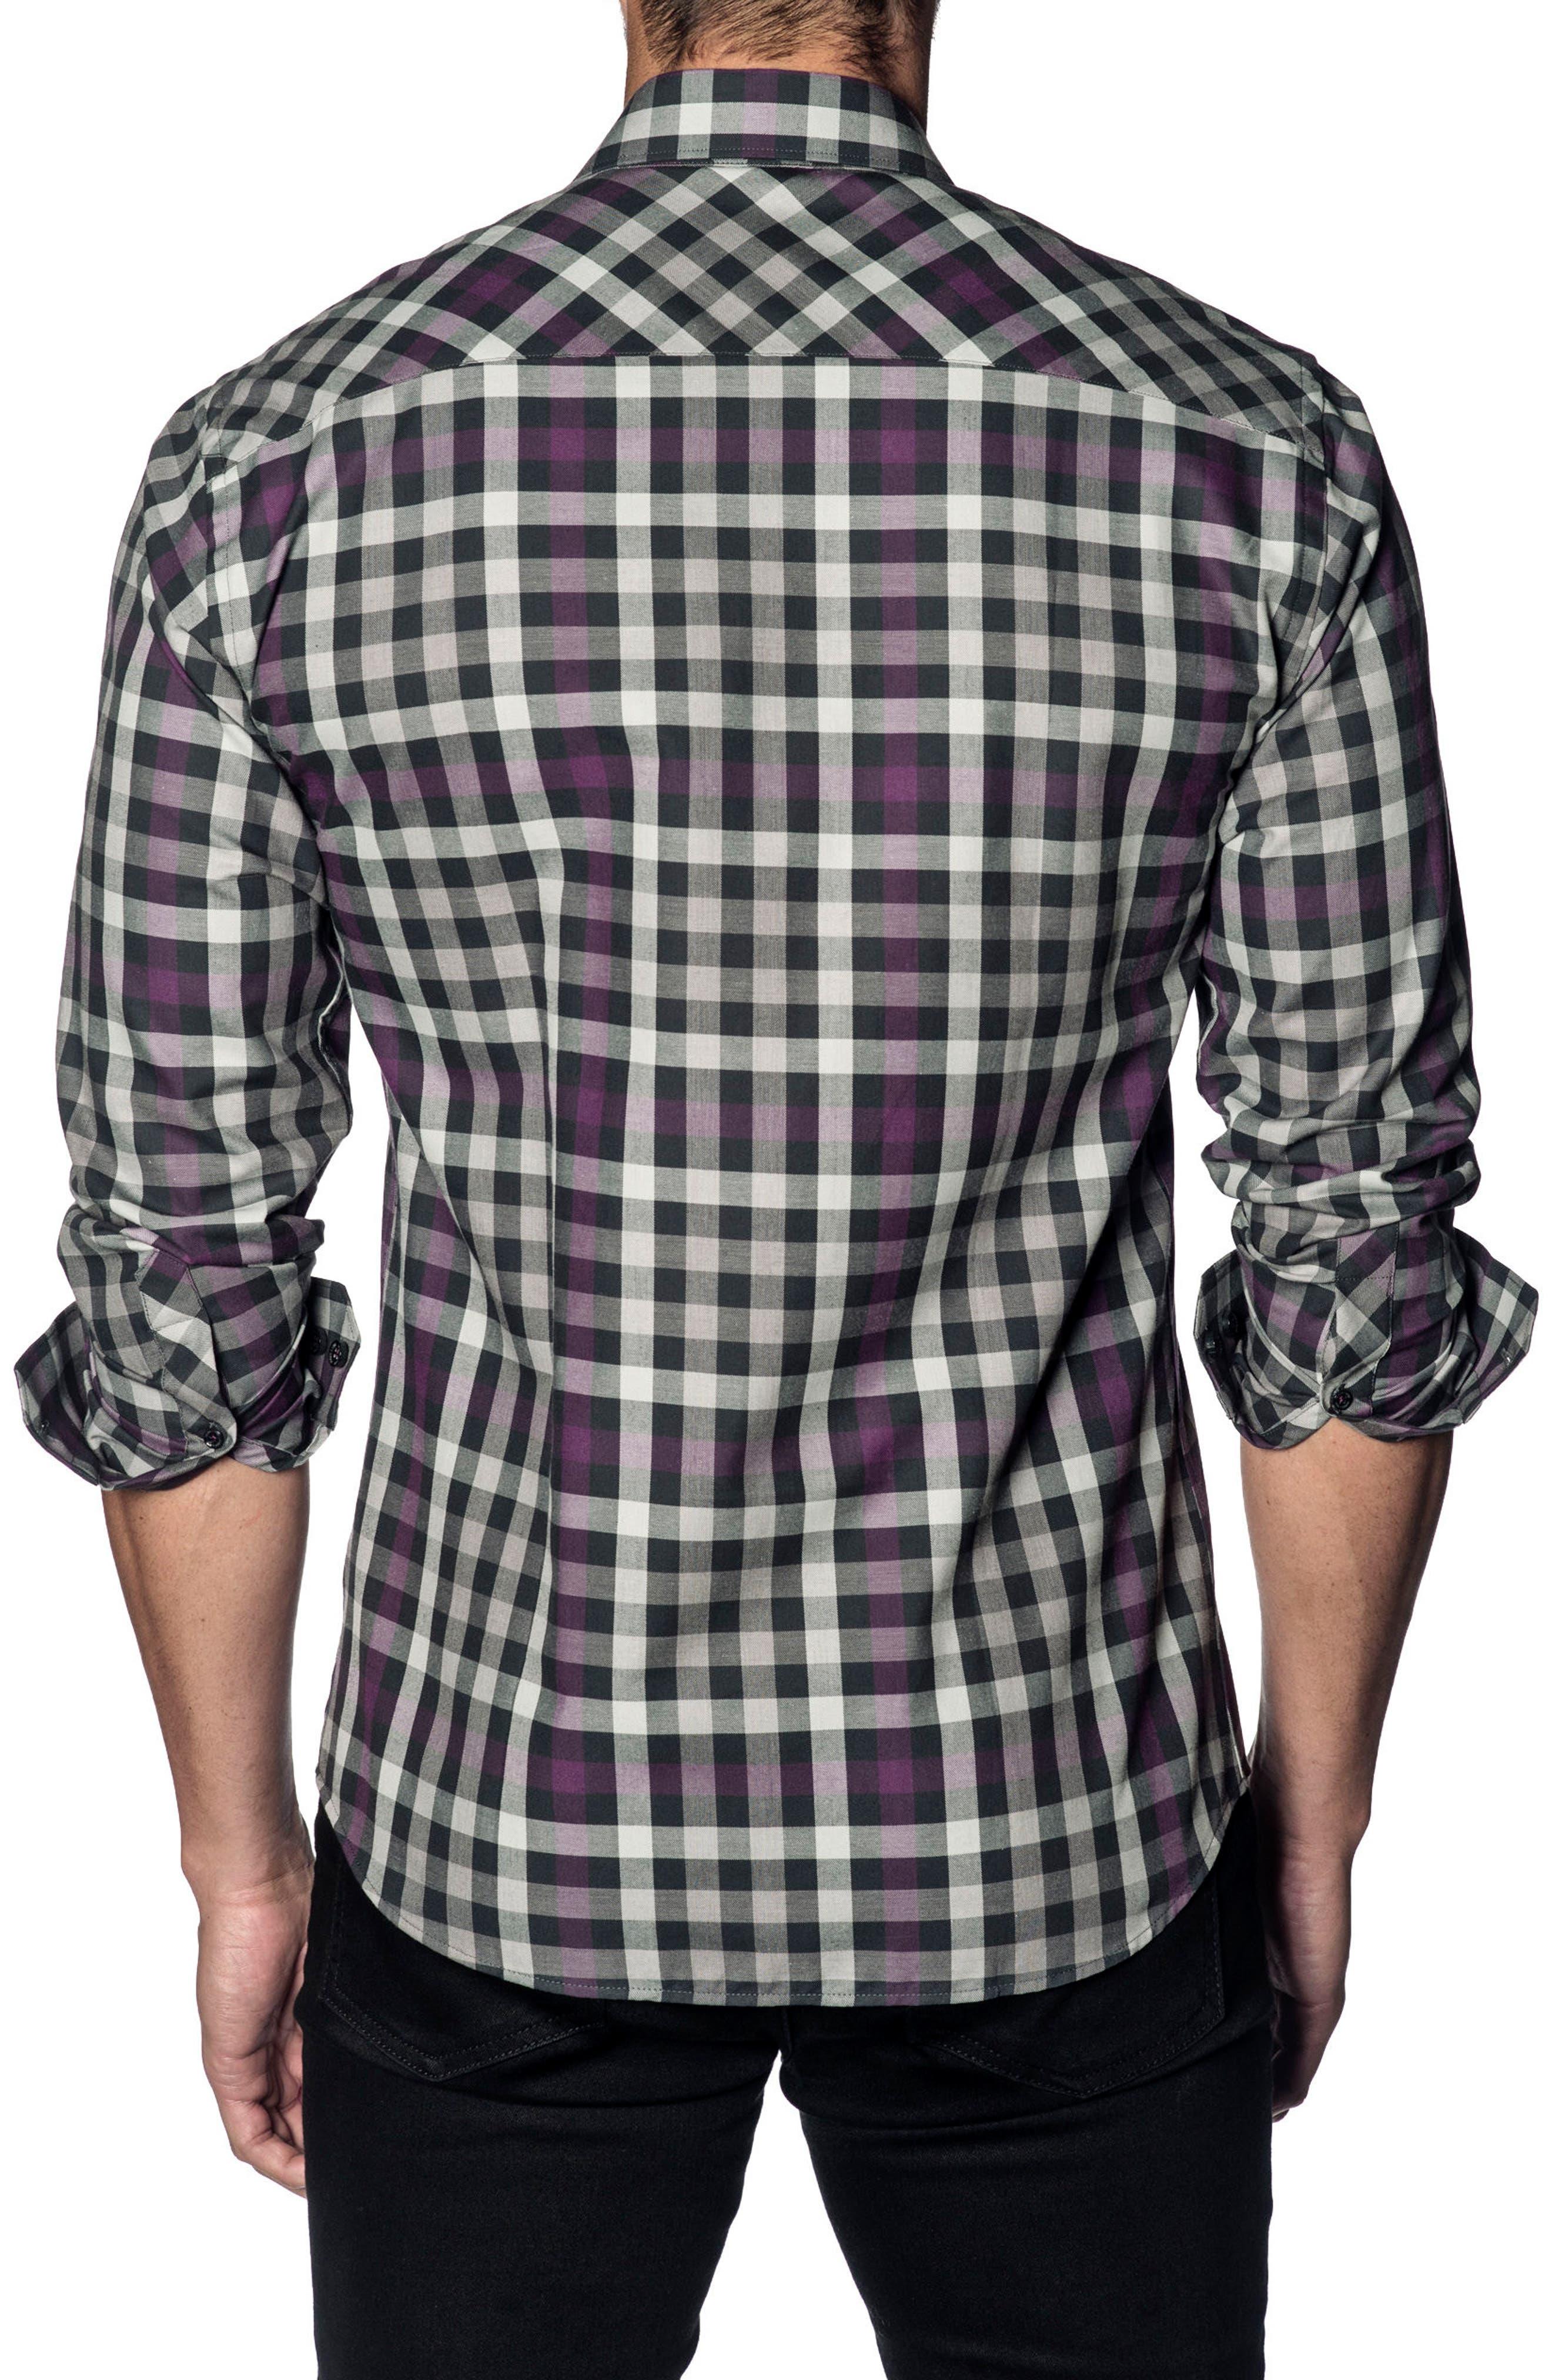 Slim Fit Check Sport Shirt,                             Alternate thumbnail 2, color,                             WHITE BLACK PURPLE CHECK